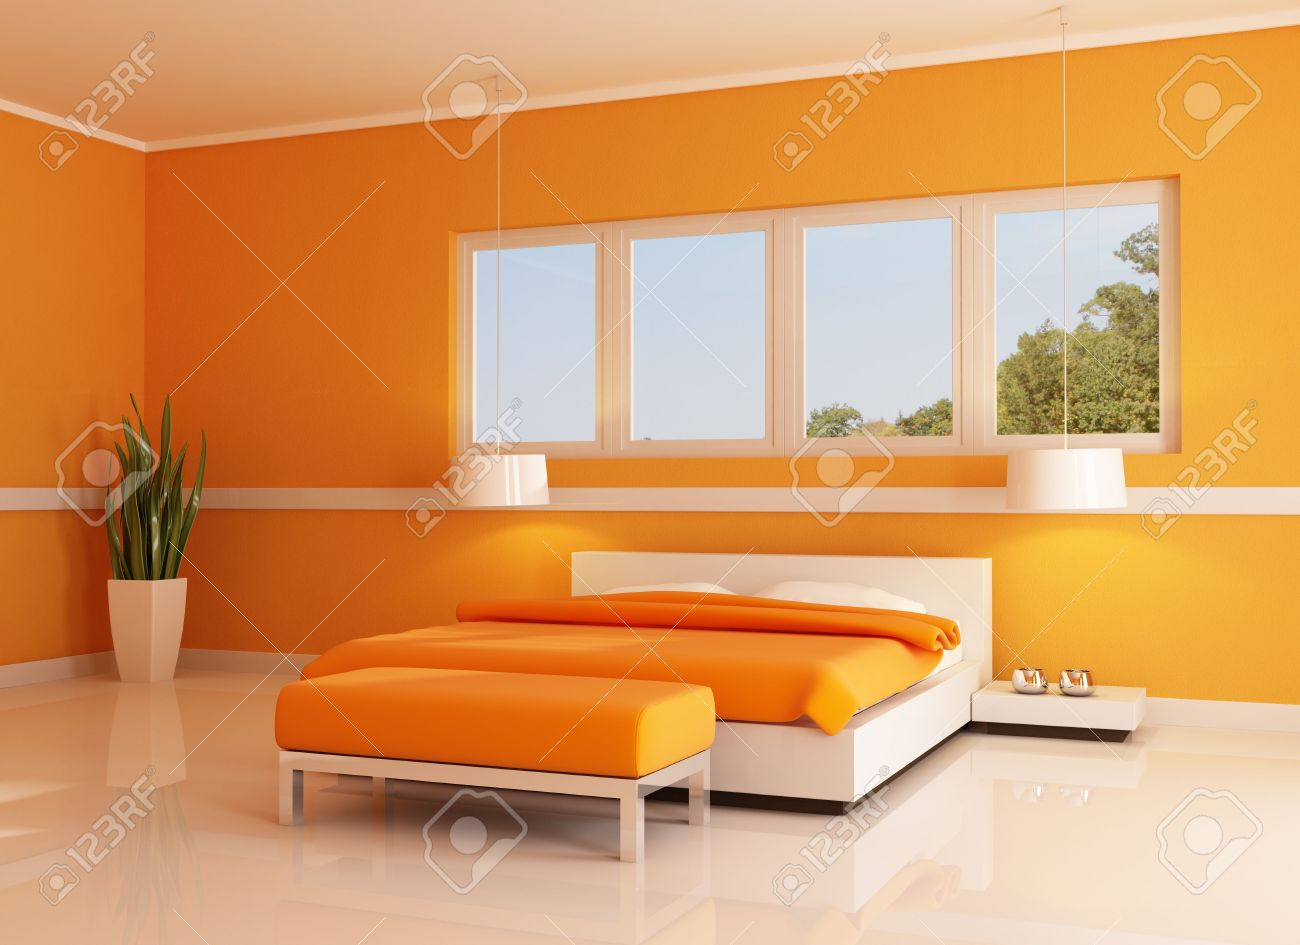 Chambre orange moderne contre la fenêtre blanche - rendu